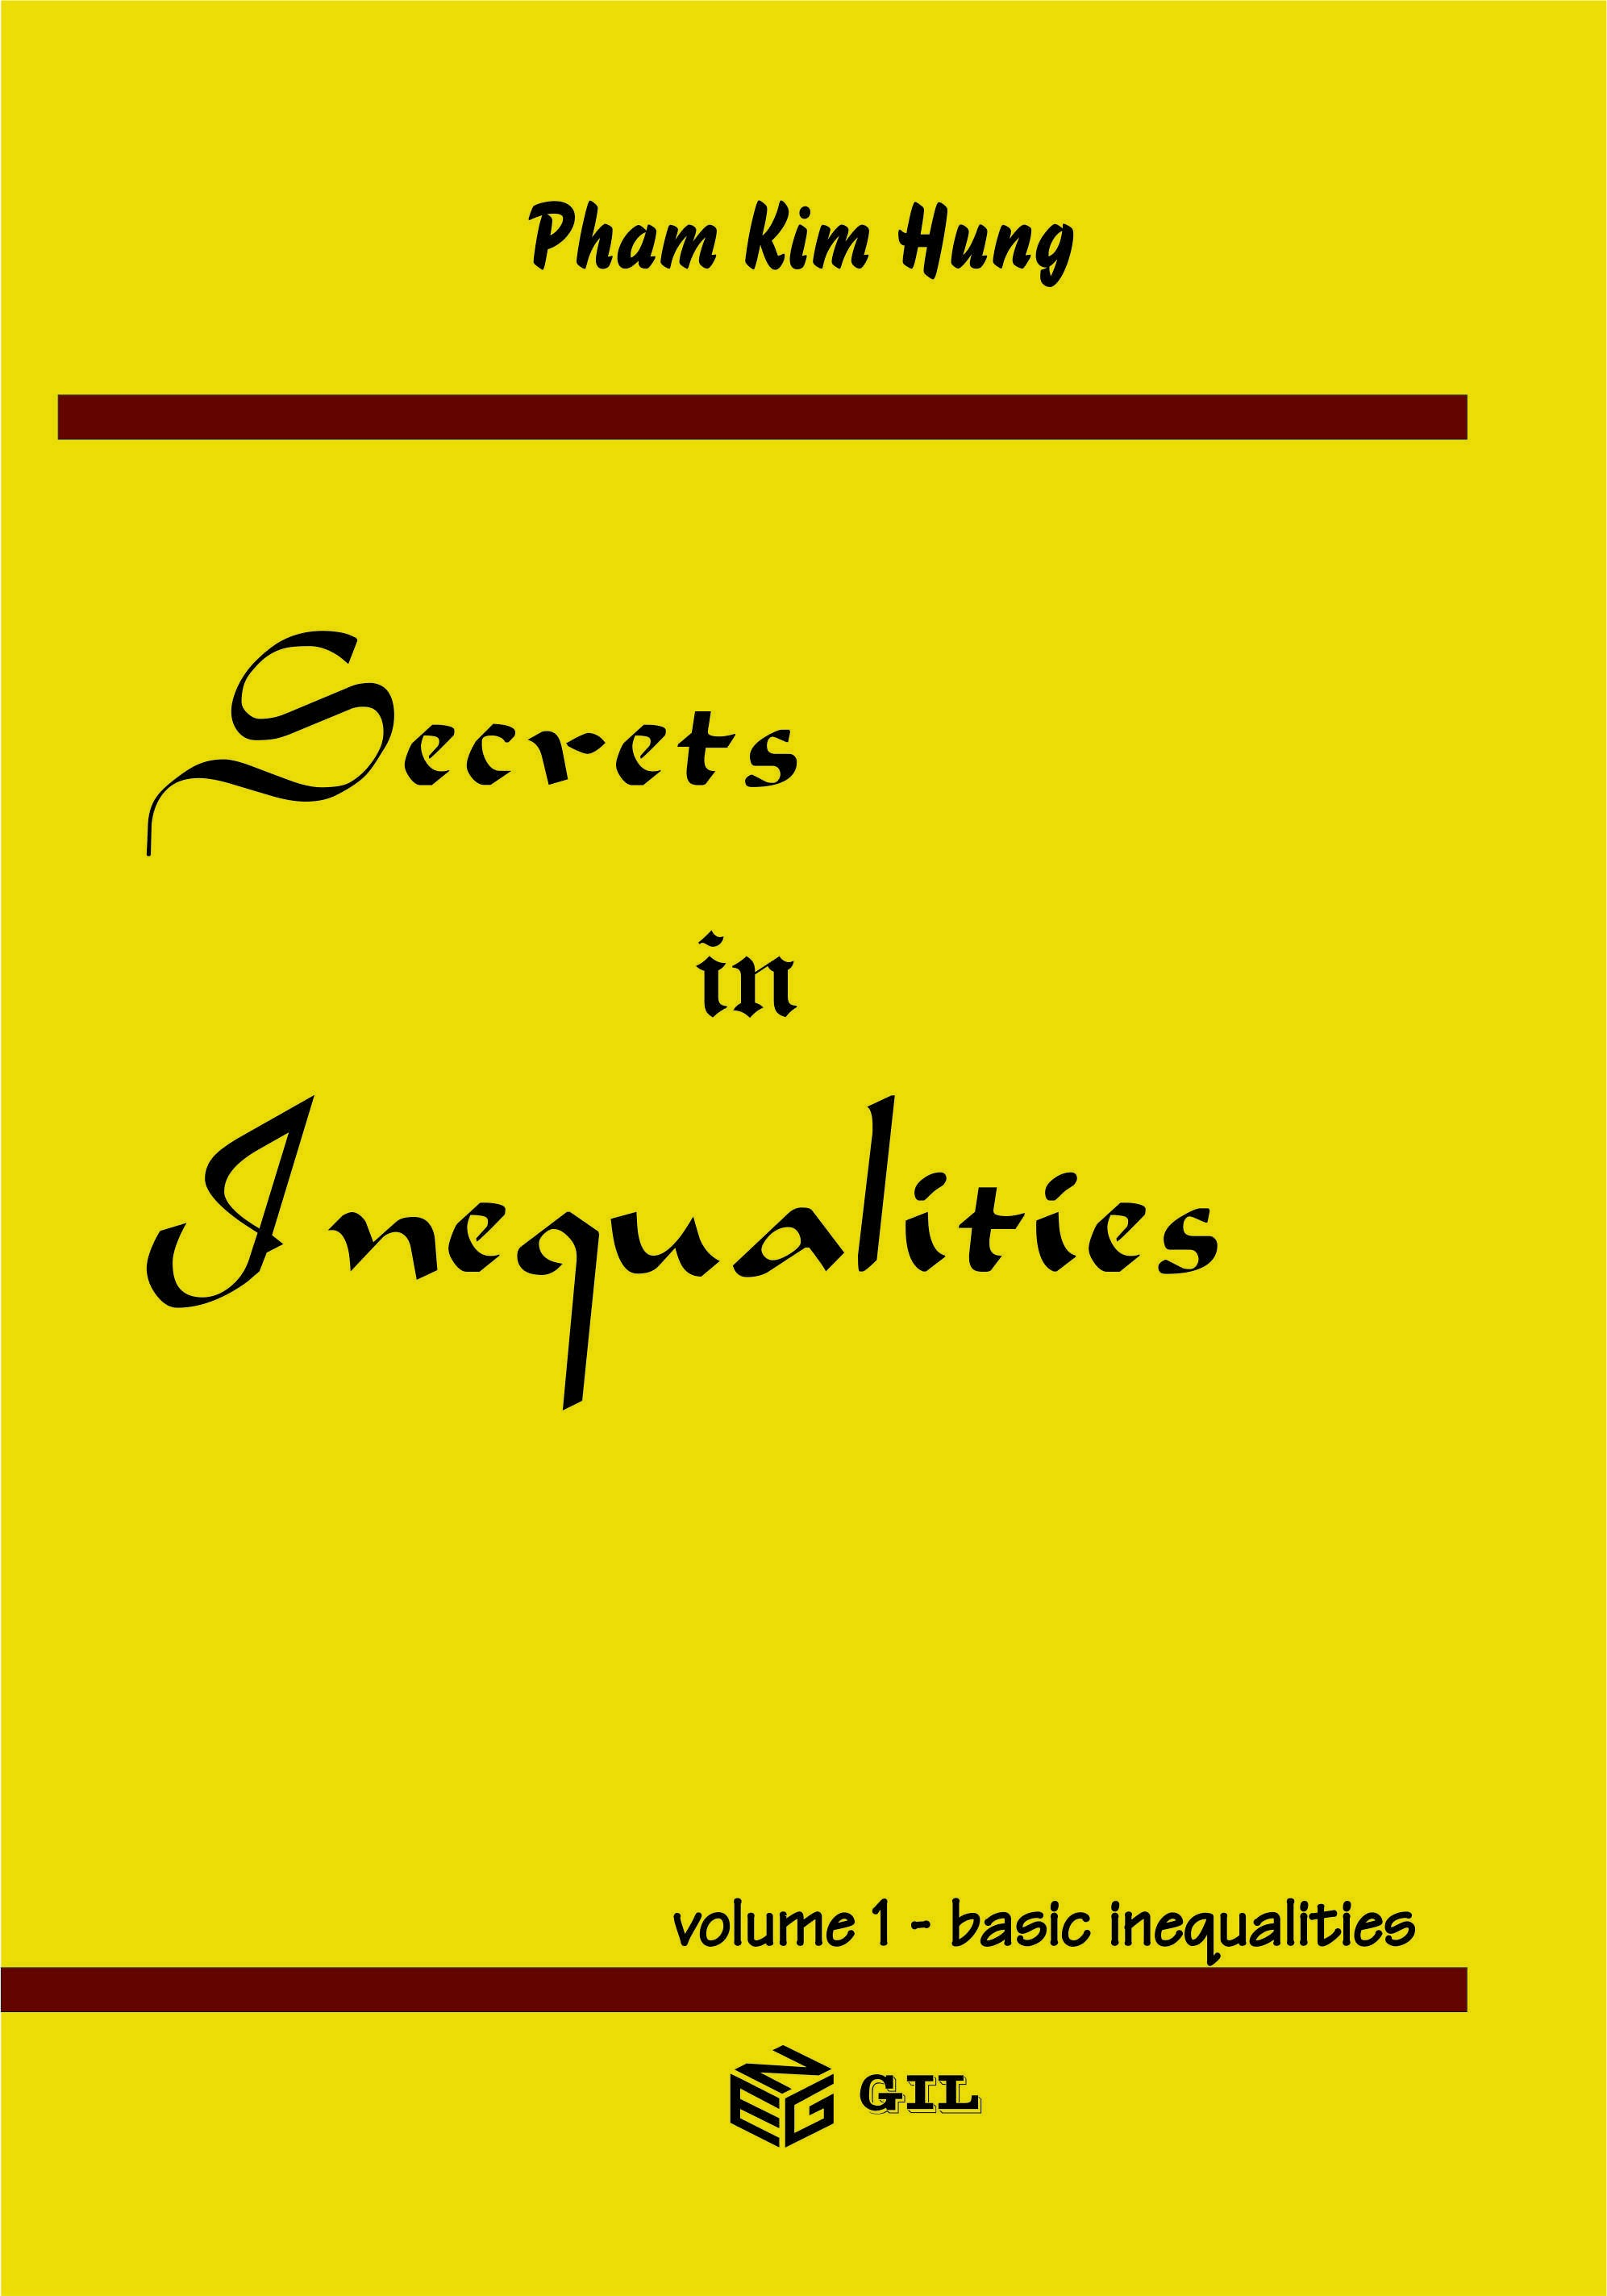 Secrets in Inequalities - basic inequalities